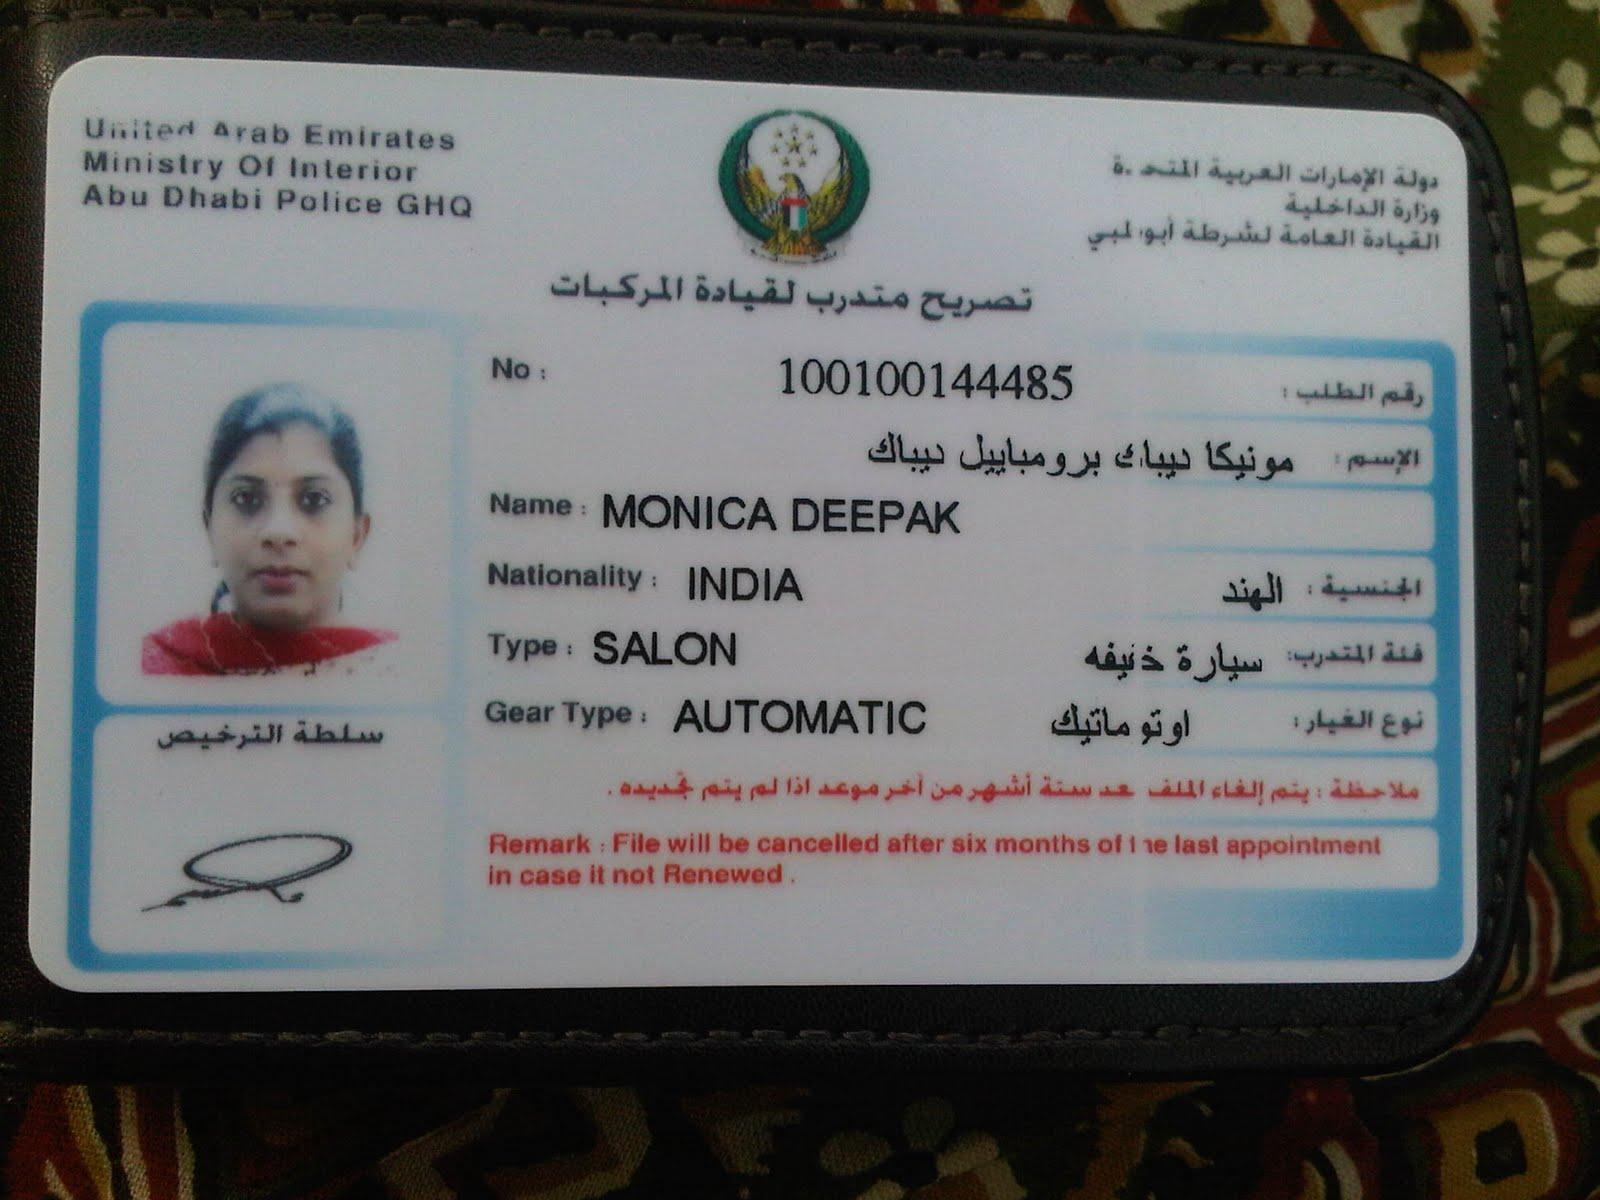 Deja Vu: My License Story